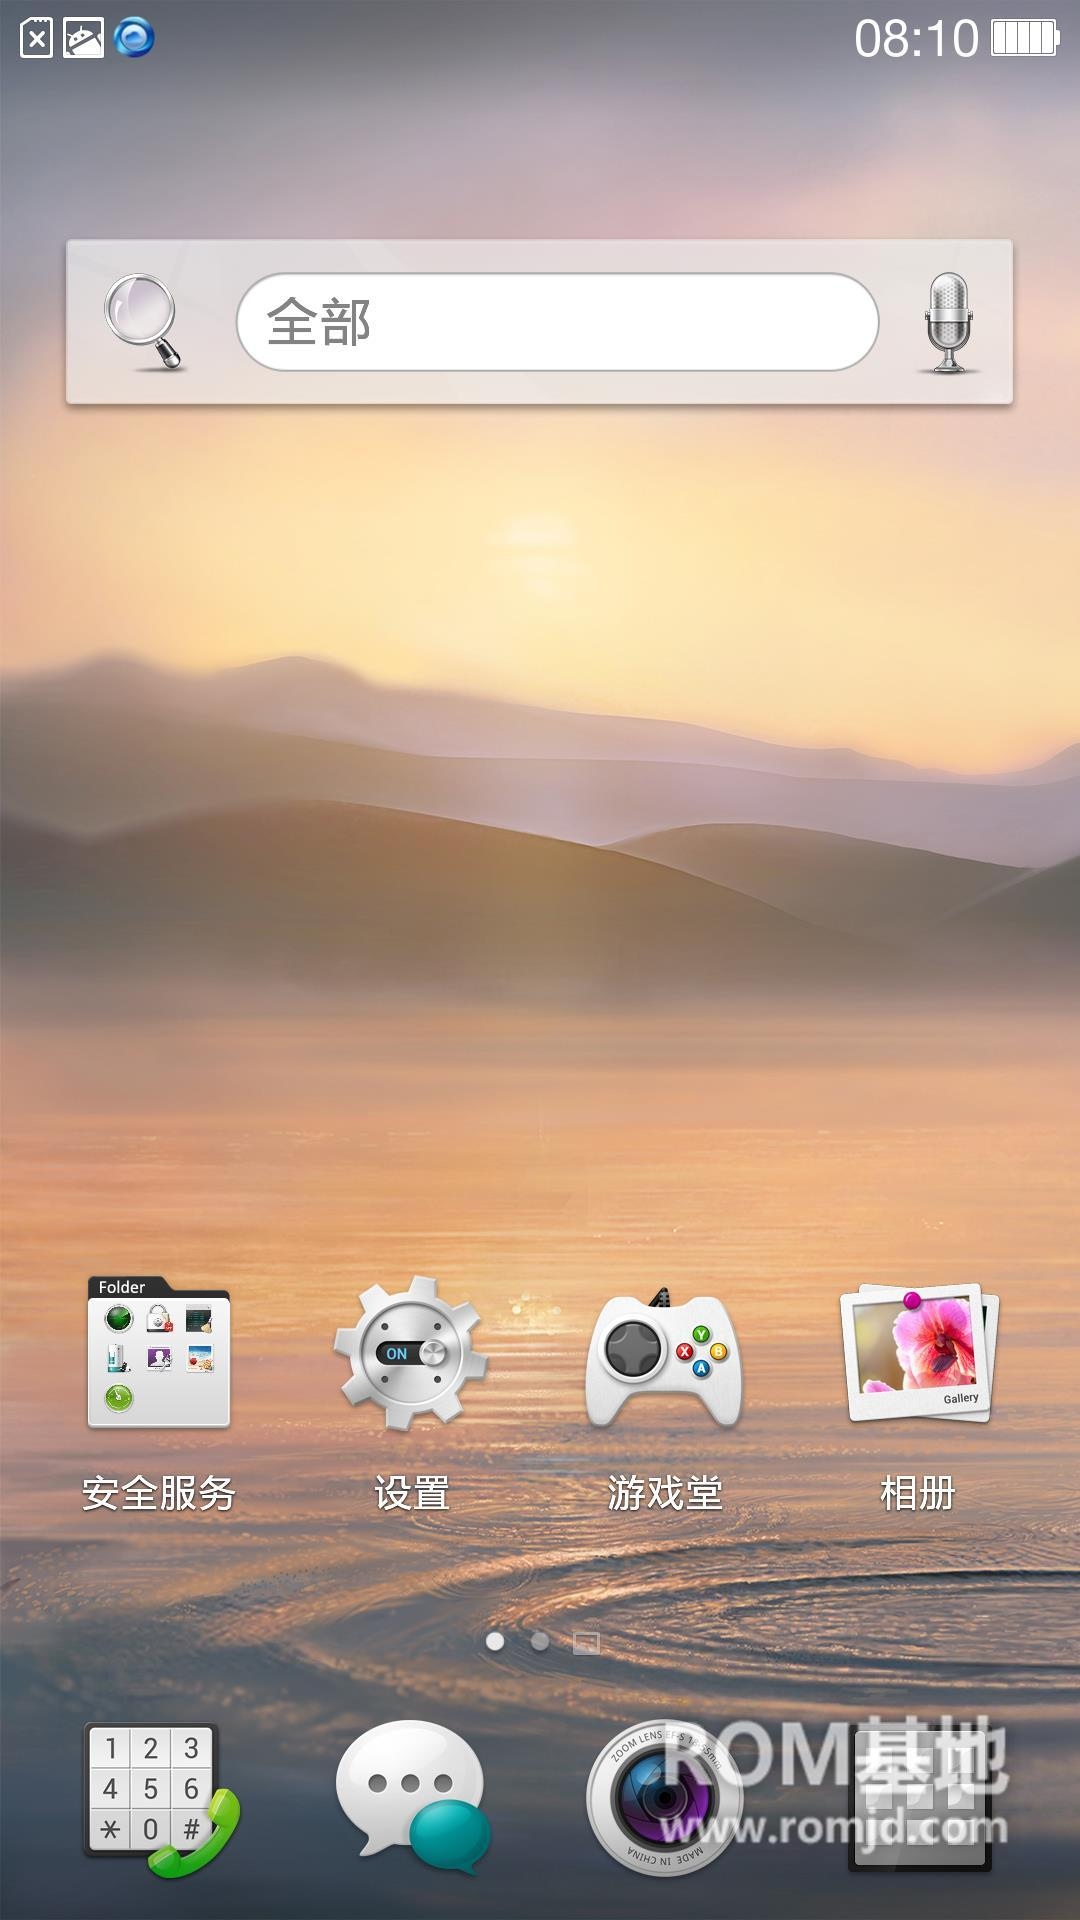 三星 i9300刷机ROM 适配版 ColorOS V1.0  20140310版ROM刷机包下载